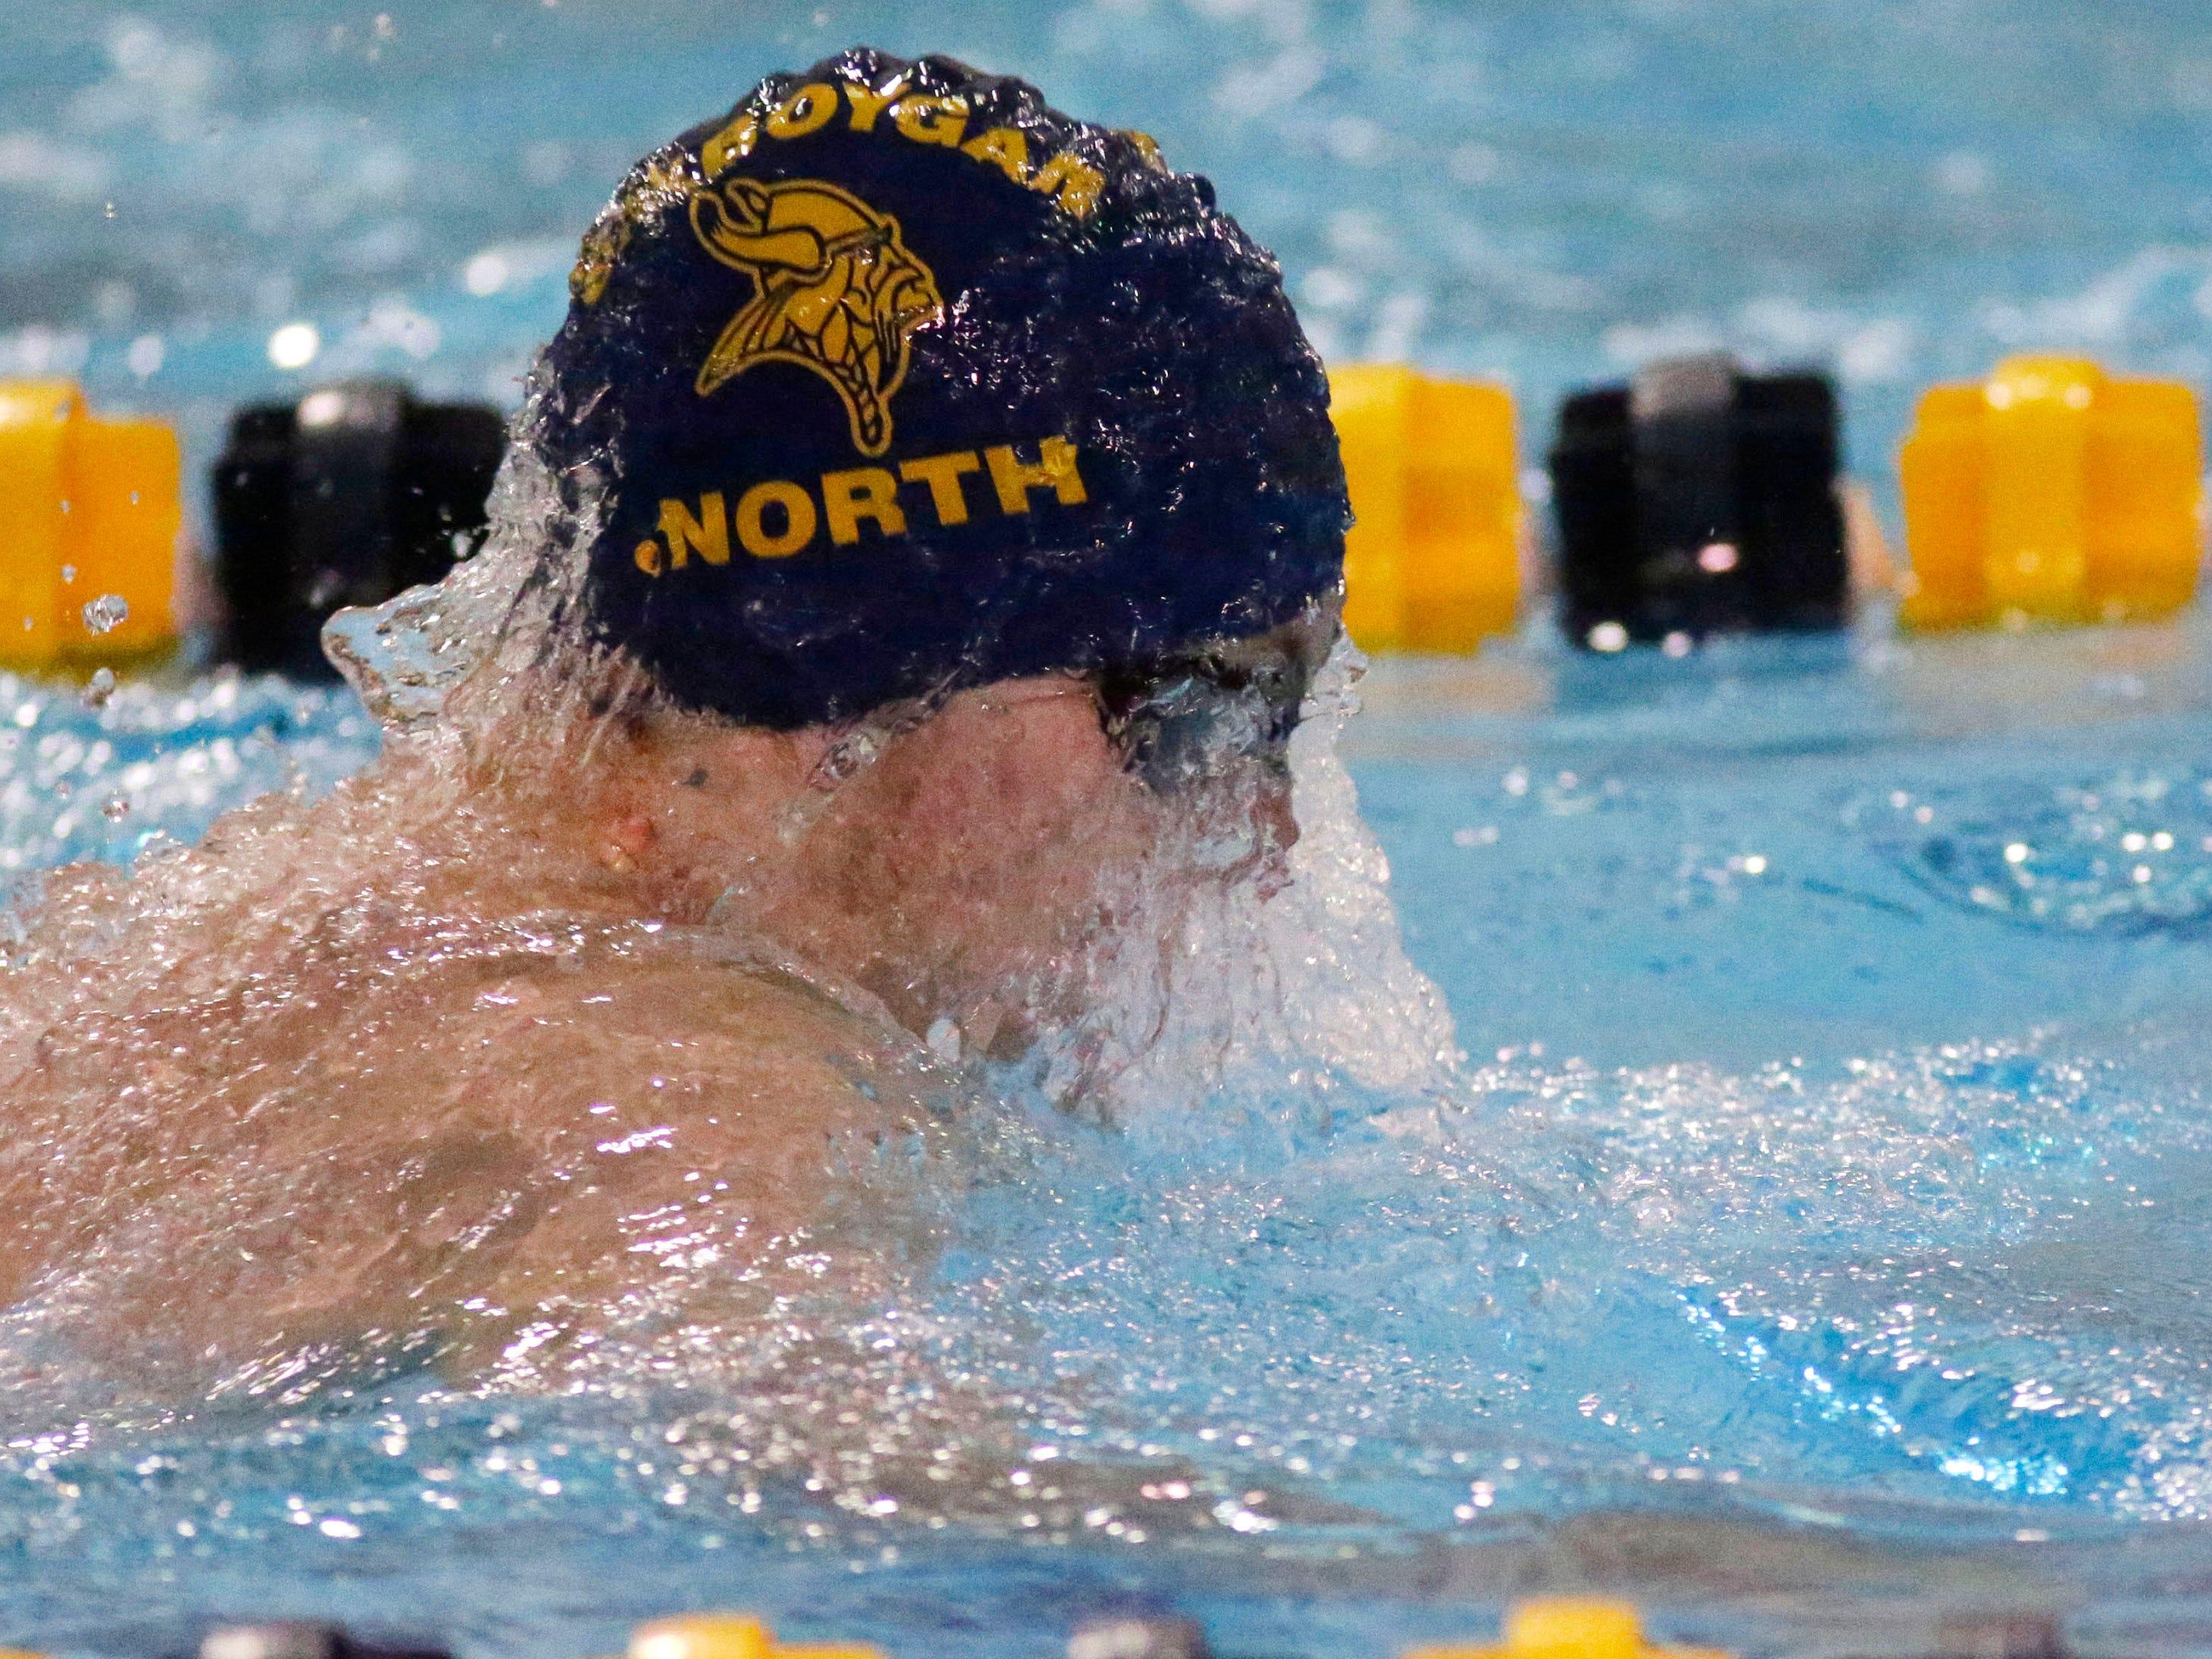 Sheboygan North's Charles Broghammer swims the 200 medley relay, Saturday, January 5, 2019, in Sheboygan, Wis.